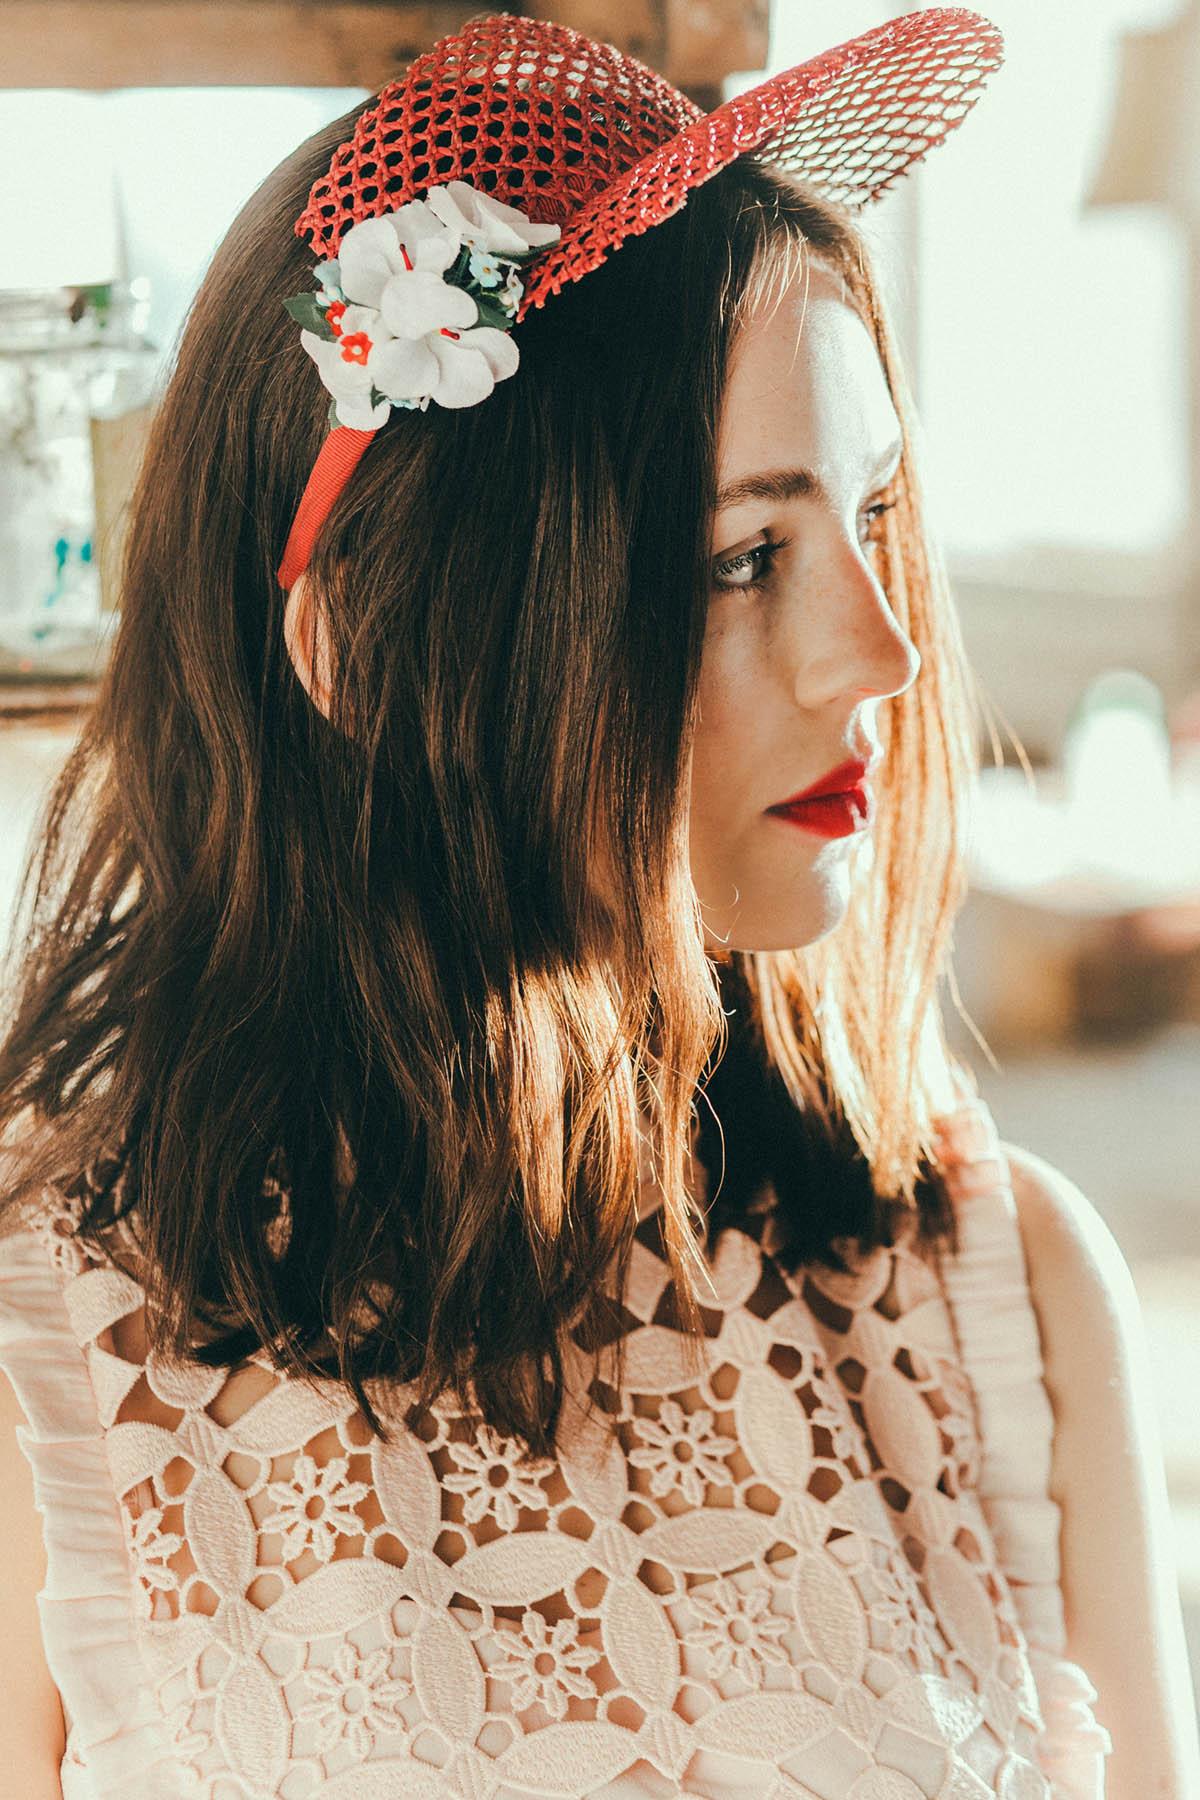 We-Are-Flowergirls_Lookbook_Flowercrown_Blumenkranz_SS17_c_Lupi-Spuma_Web_07.jpg